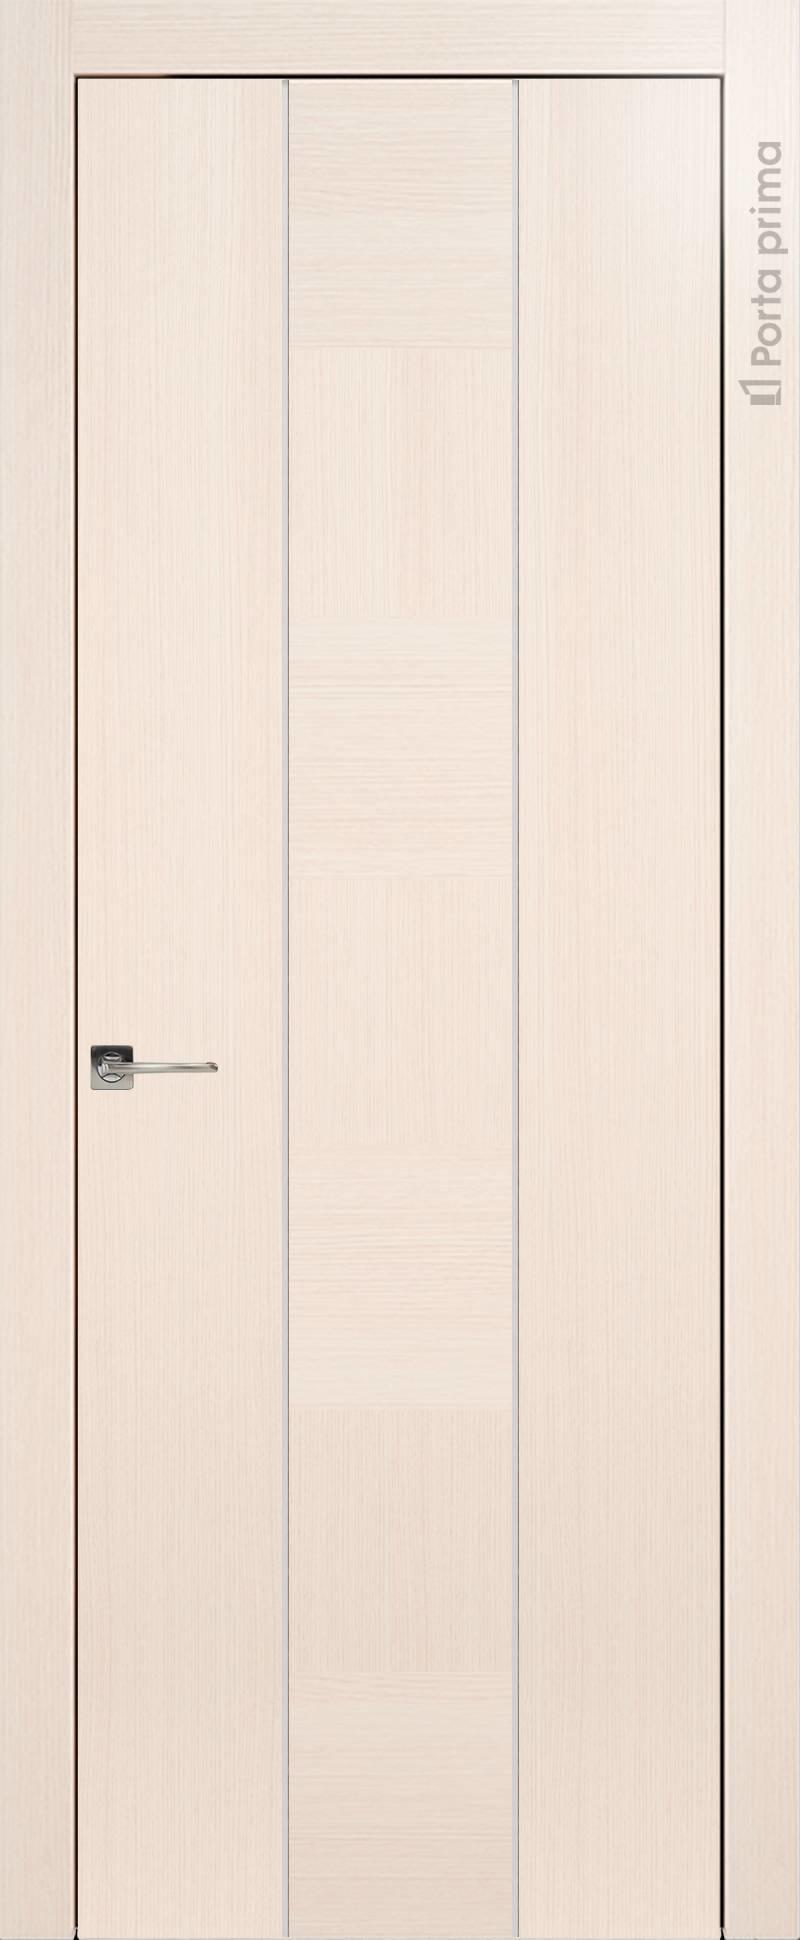 Tivoli Б-1 цвет - Беленый дуб Без стекла (ДГ)